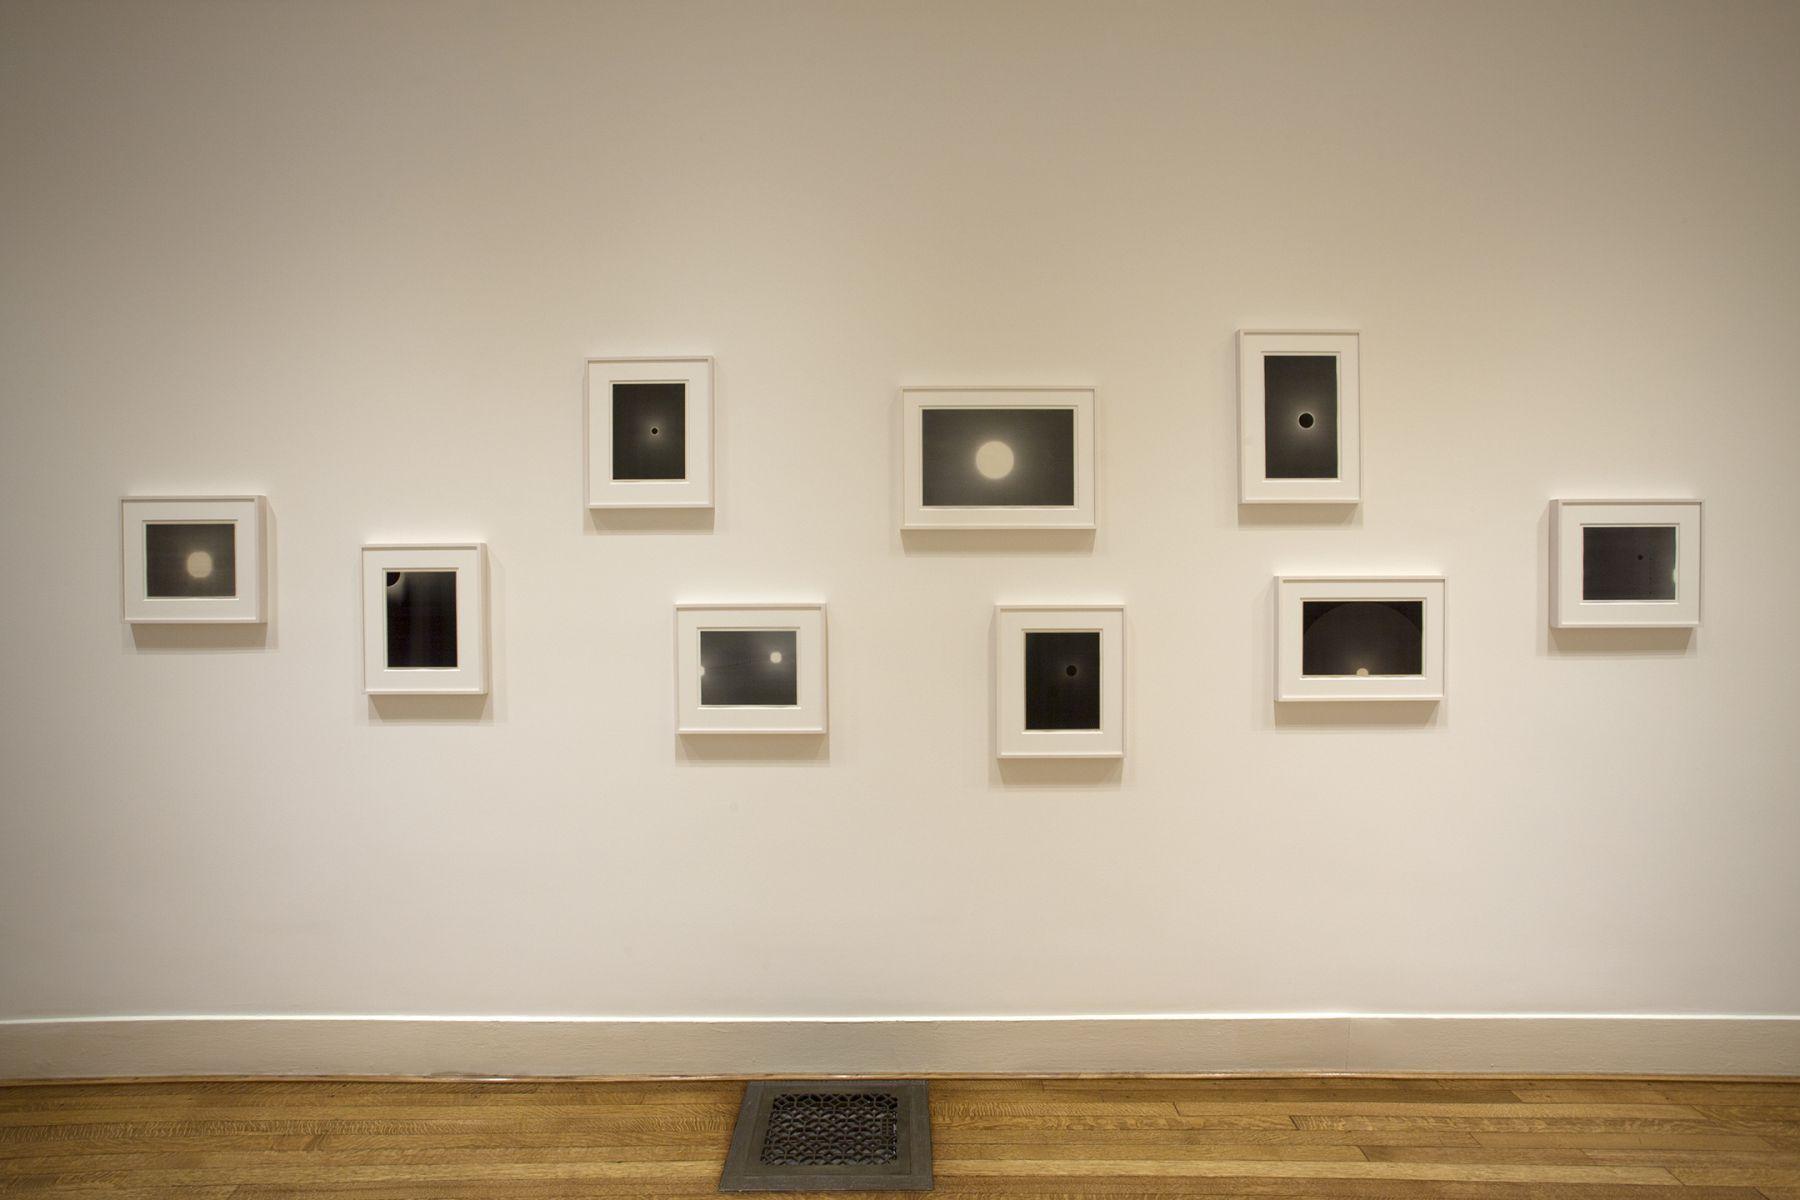 Marsha Cottrell Installation View